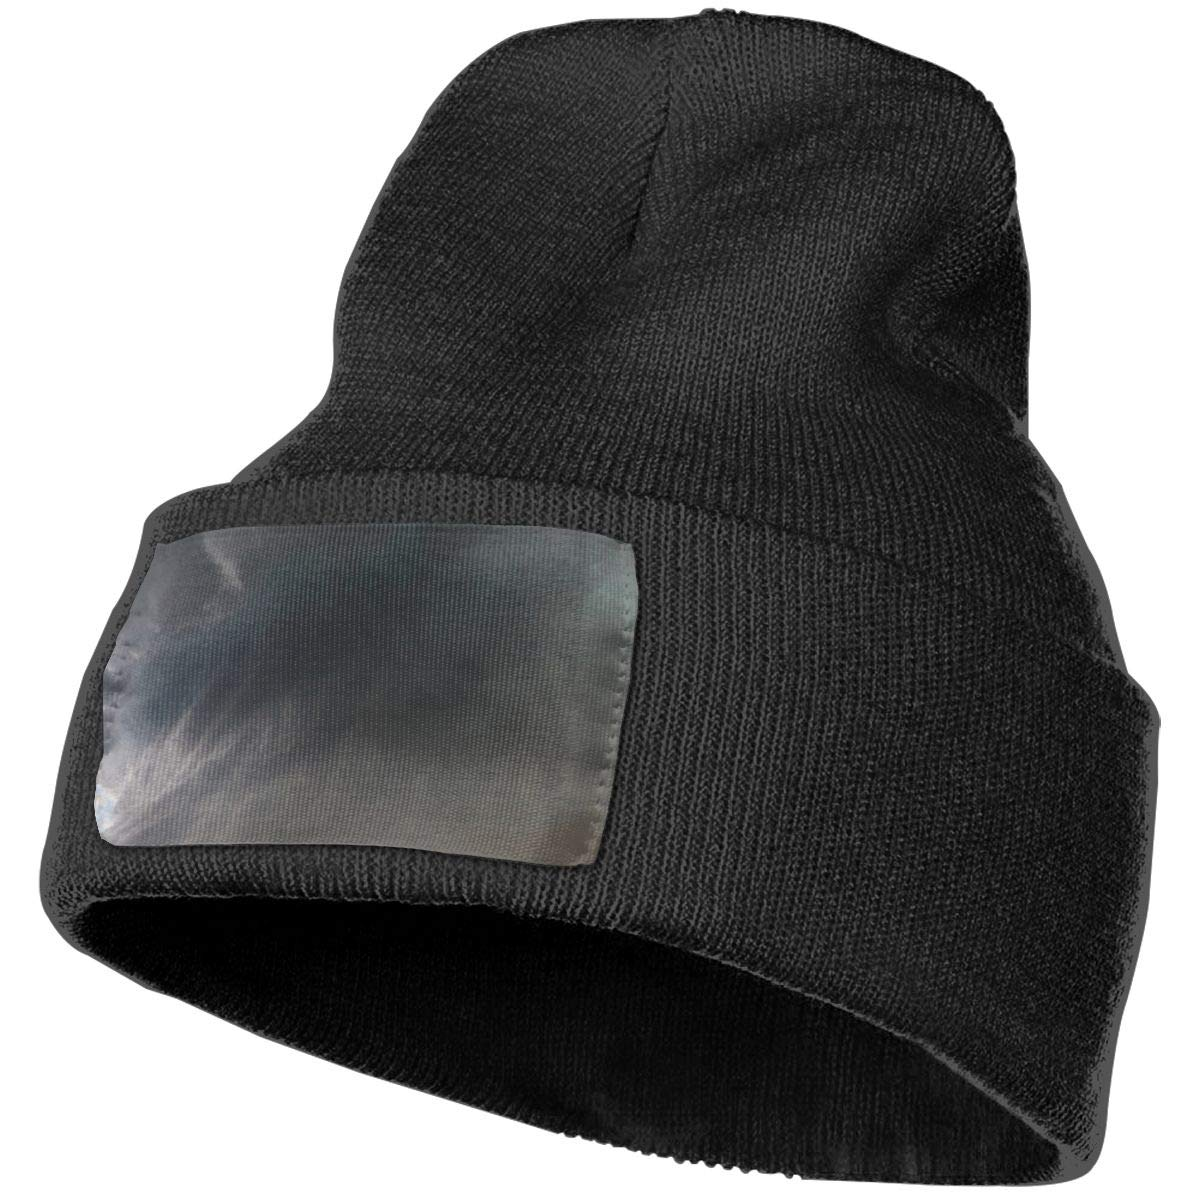 Sheery Tornado Casual Knit Cap for Men Women 100/% Acrylic Acid Skull Cap Woolen Hat